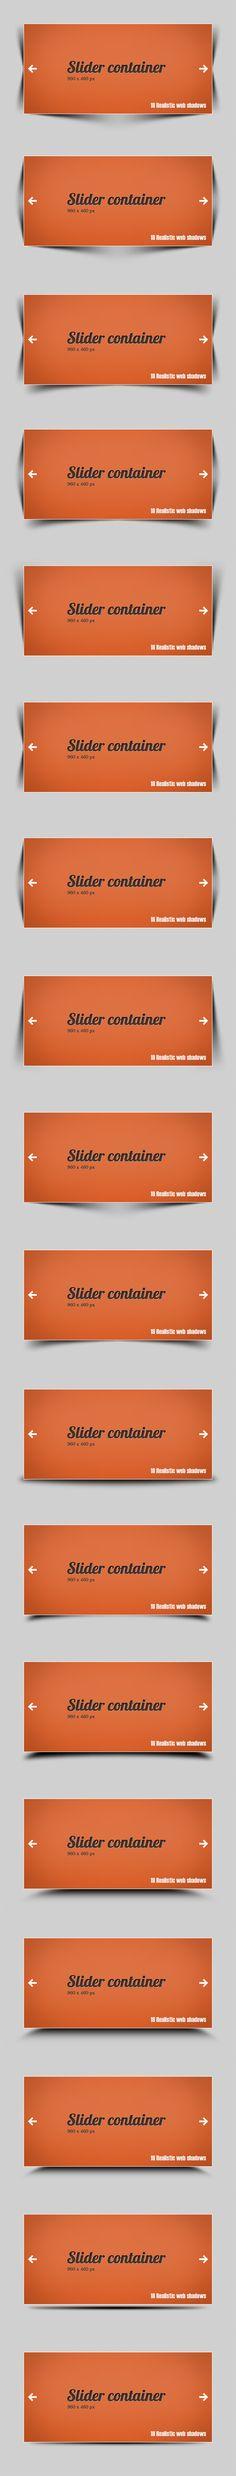 Web Shadows for Sliders